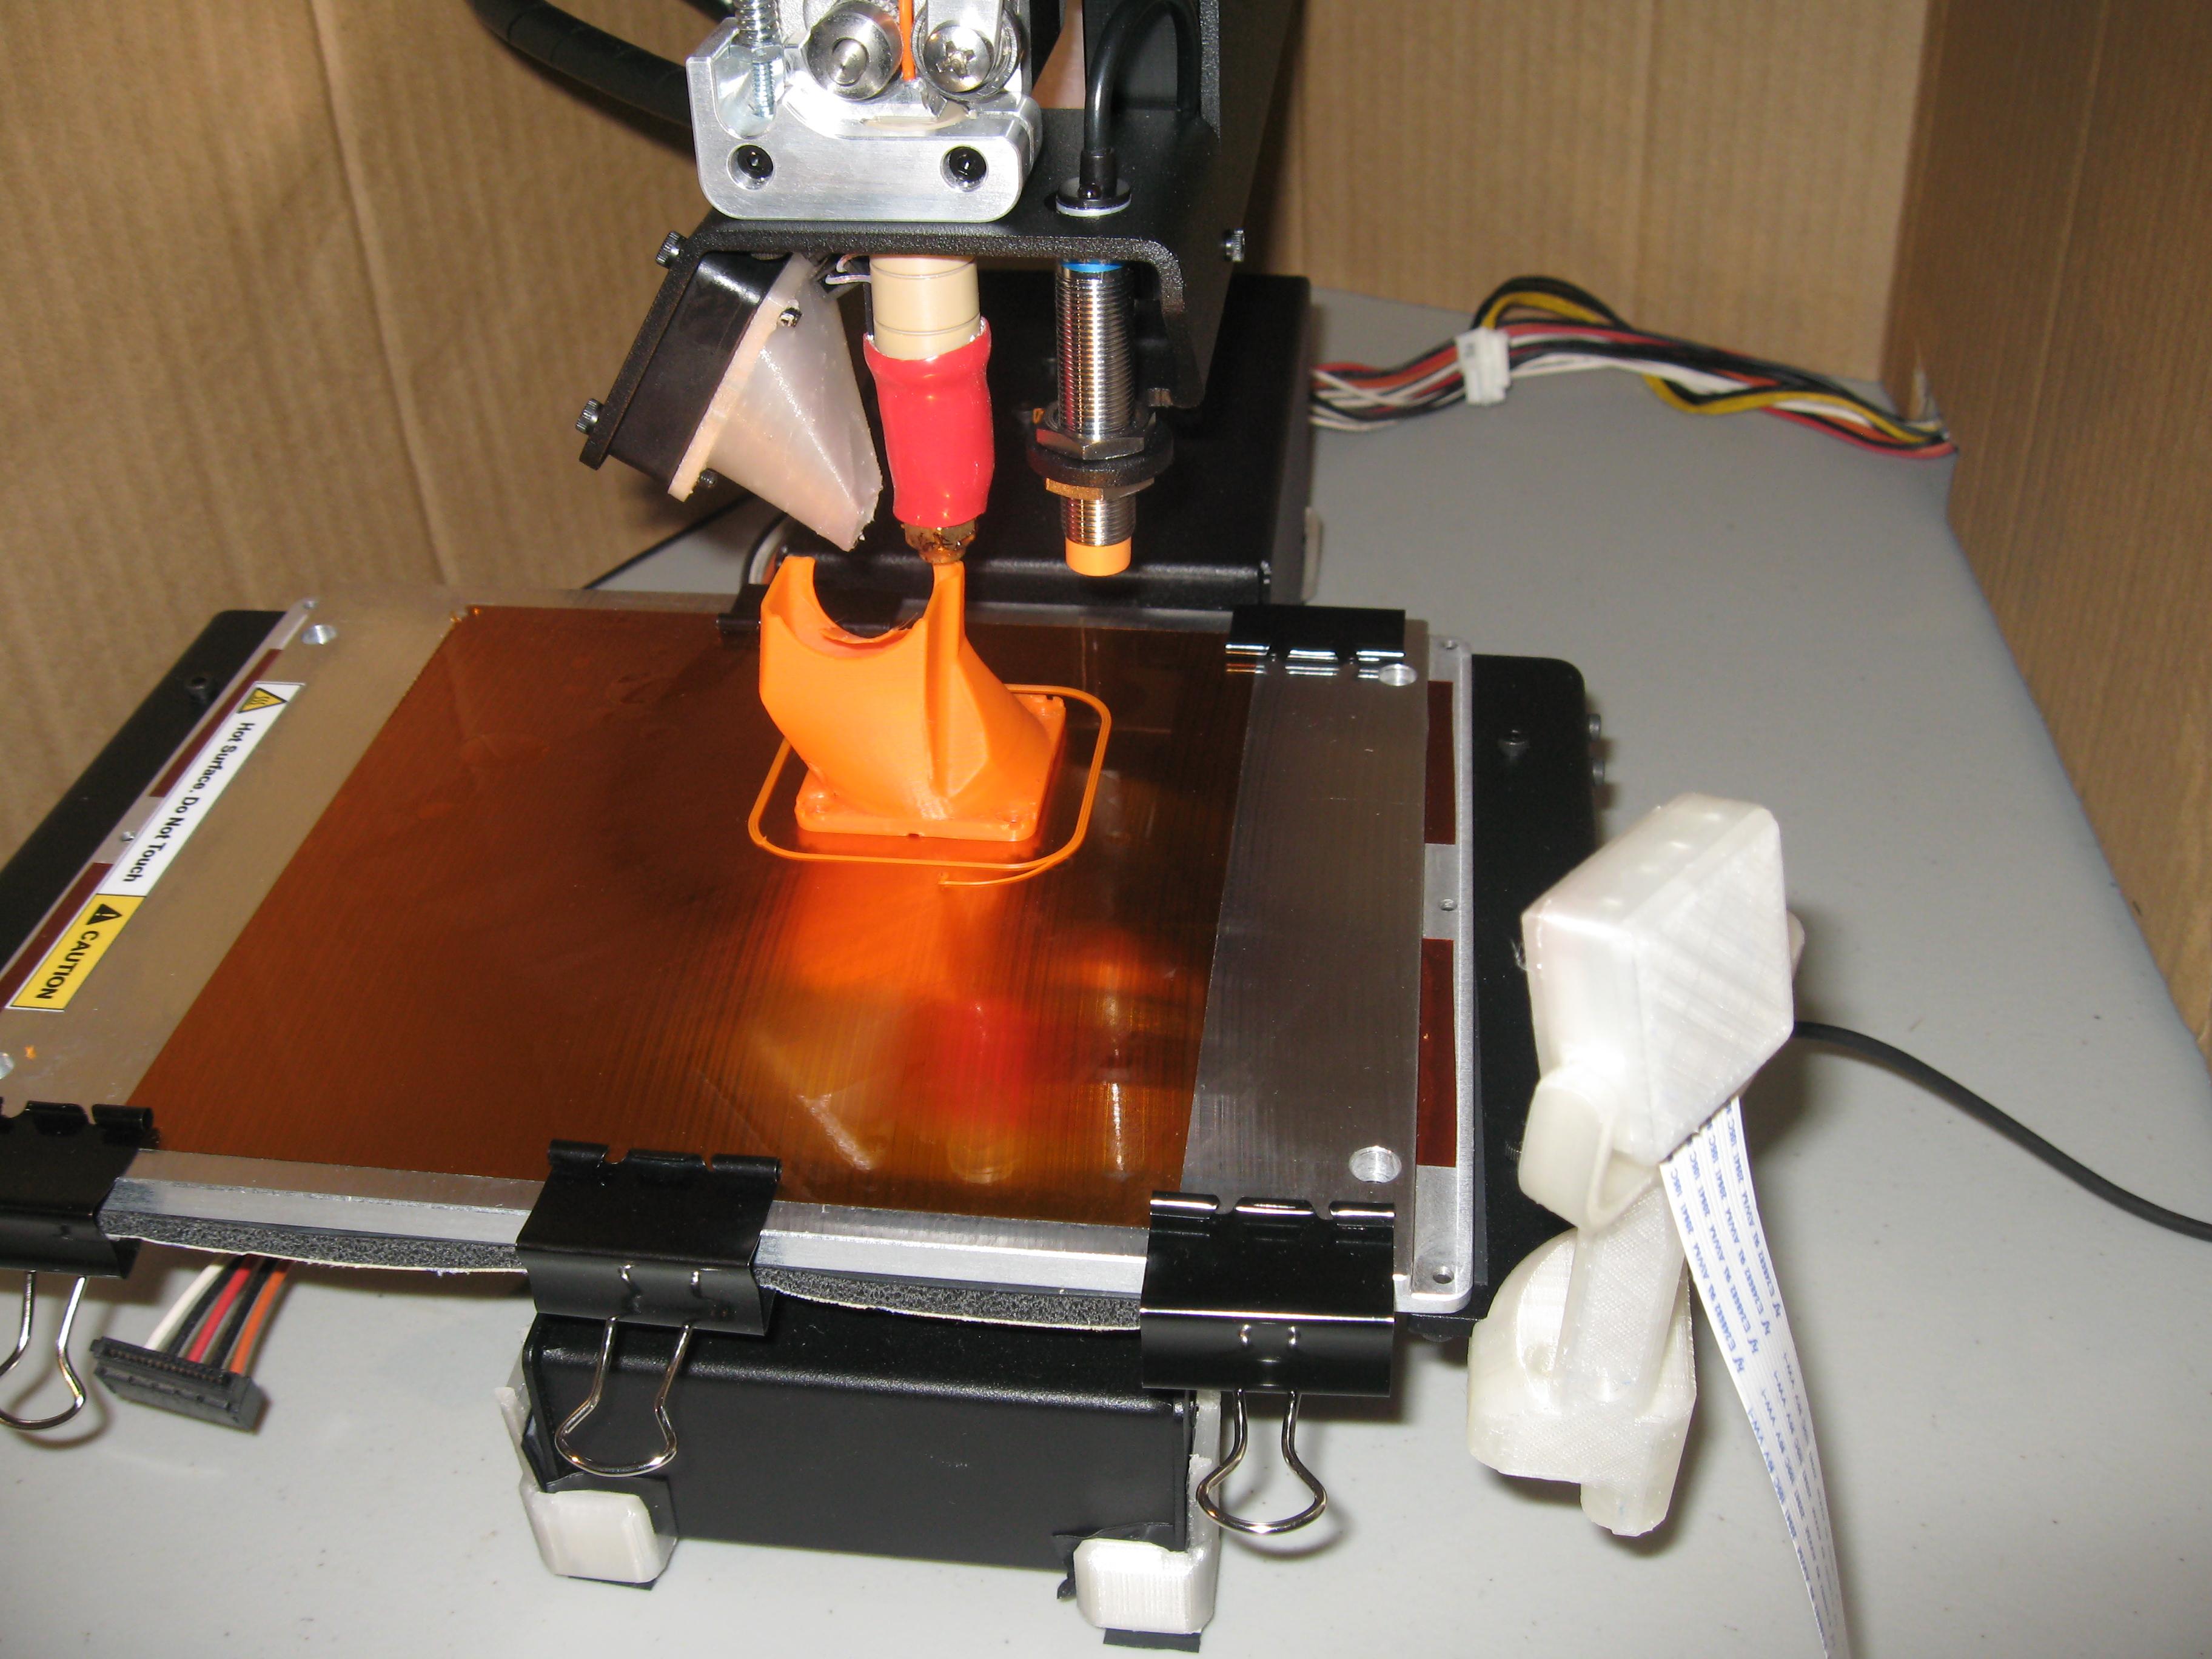 3d printing sizemorelabs